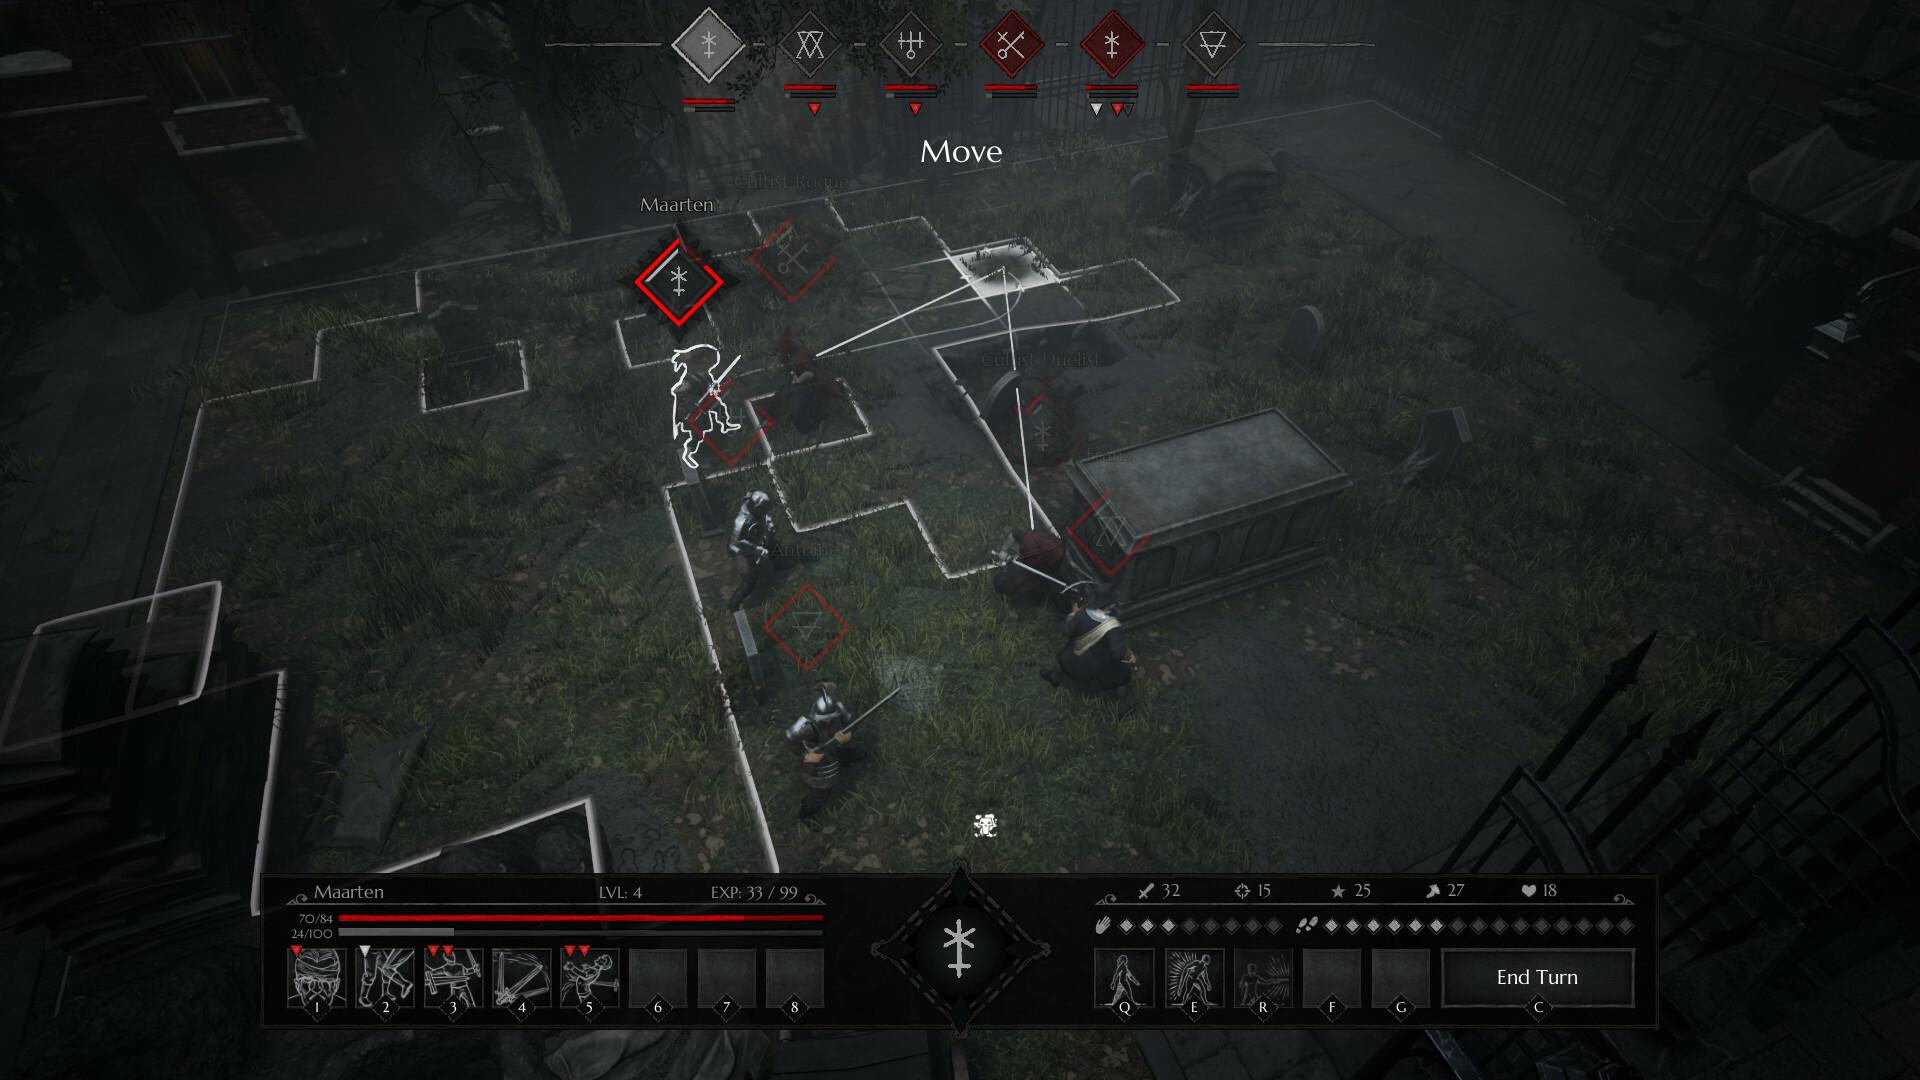 black-legend-pc-screenshot-1